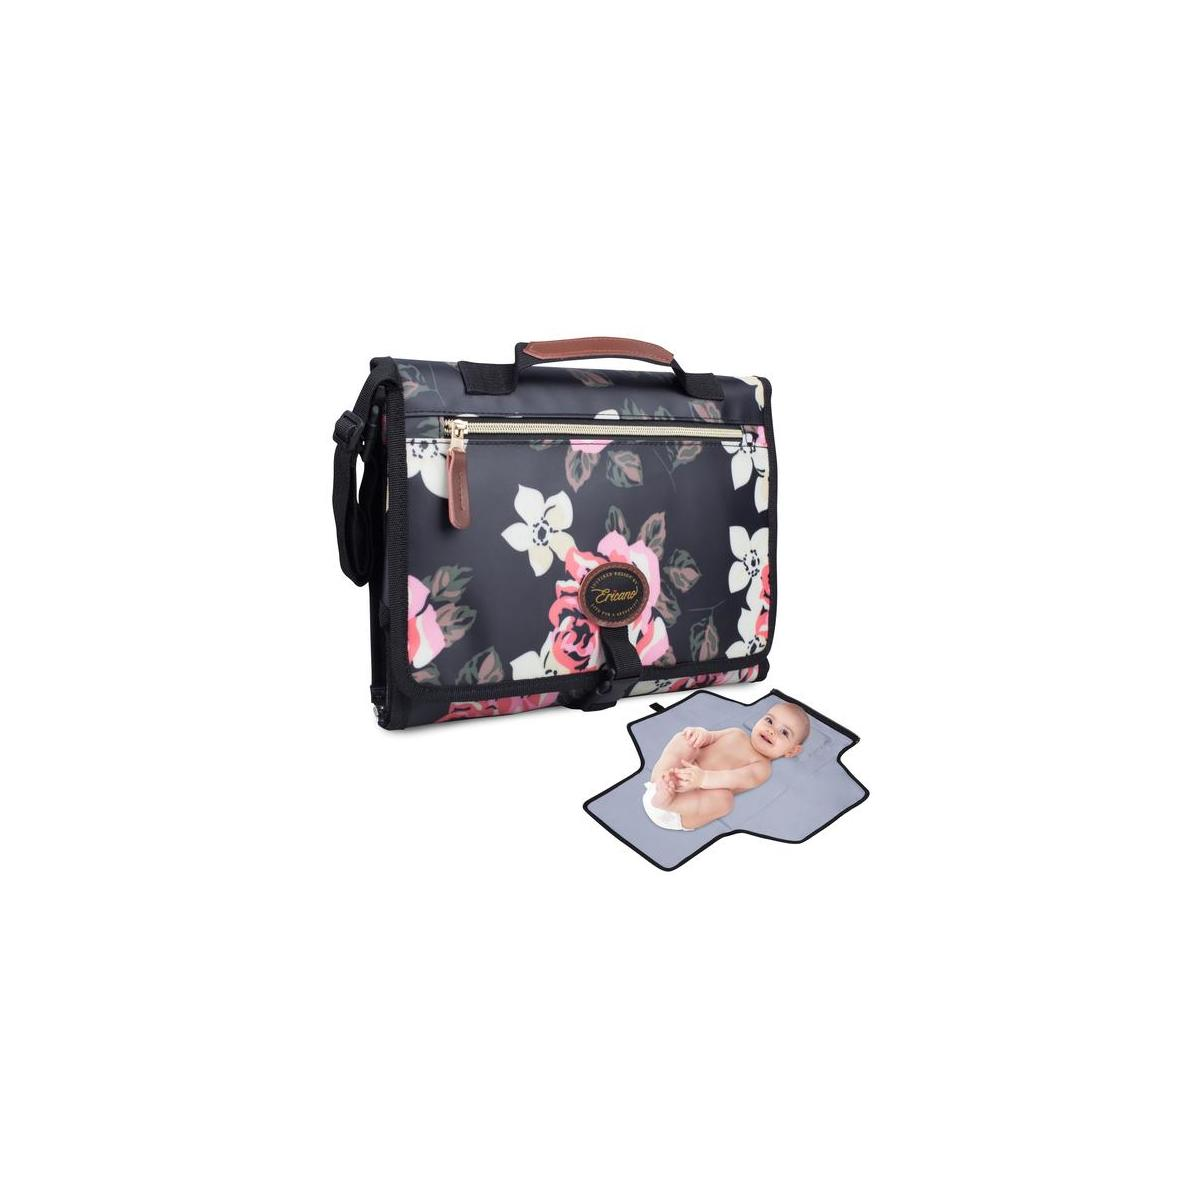 Diaper Changing Pad - Ericano portable diaper clutch bag